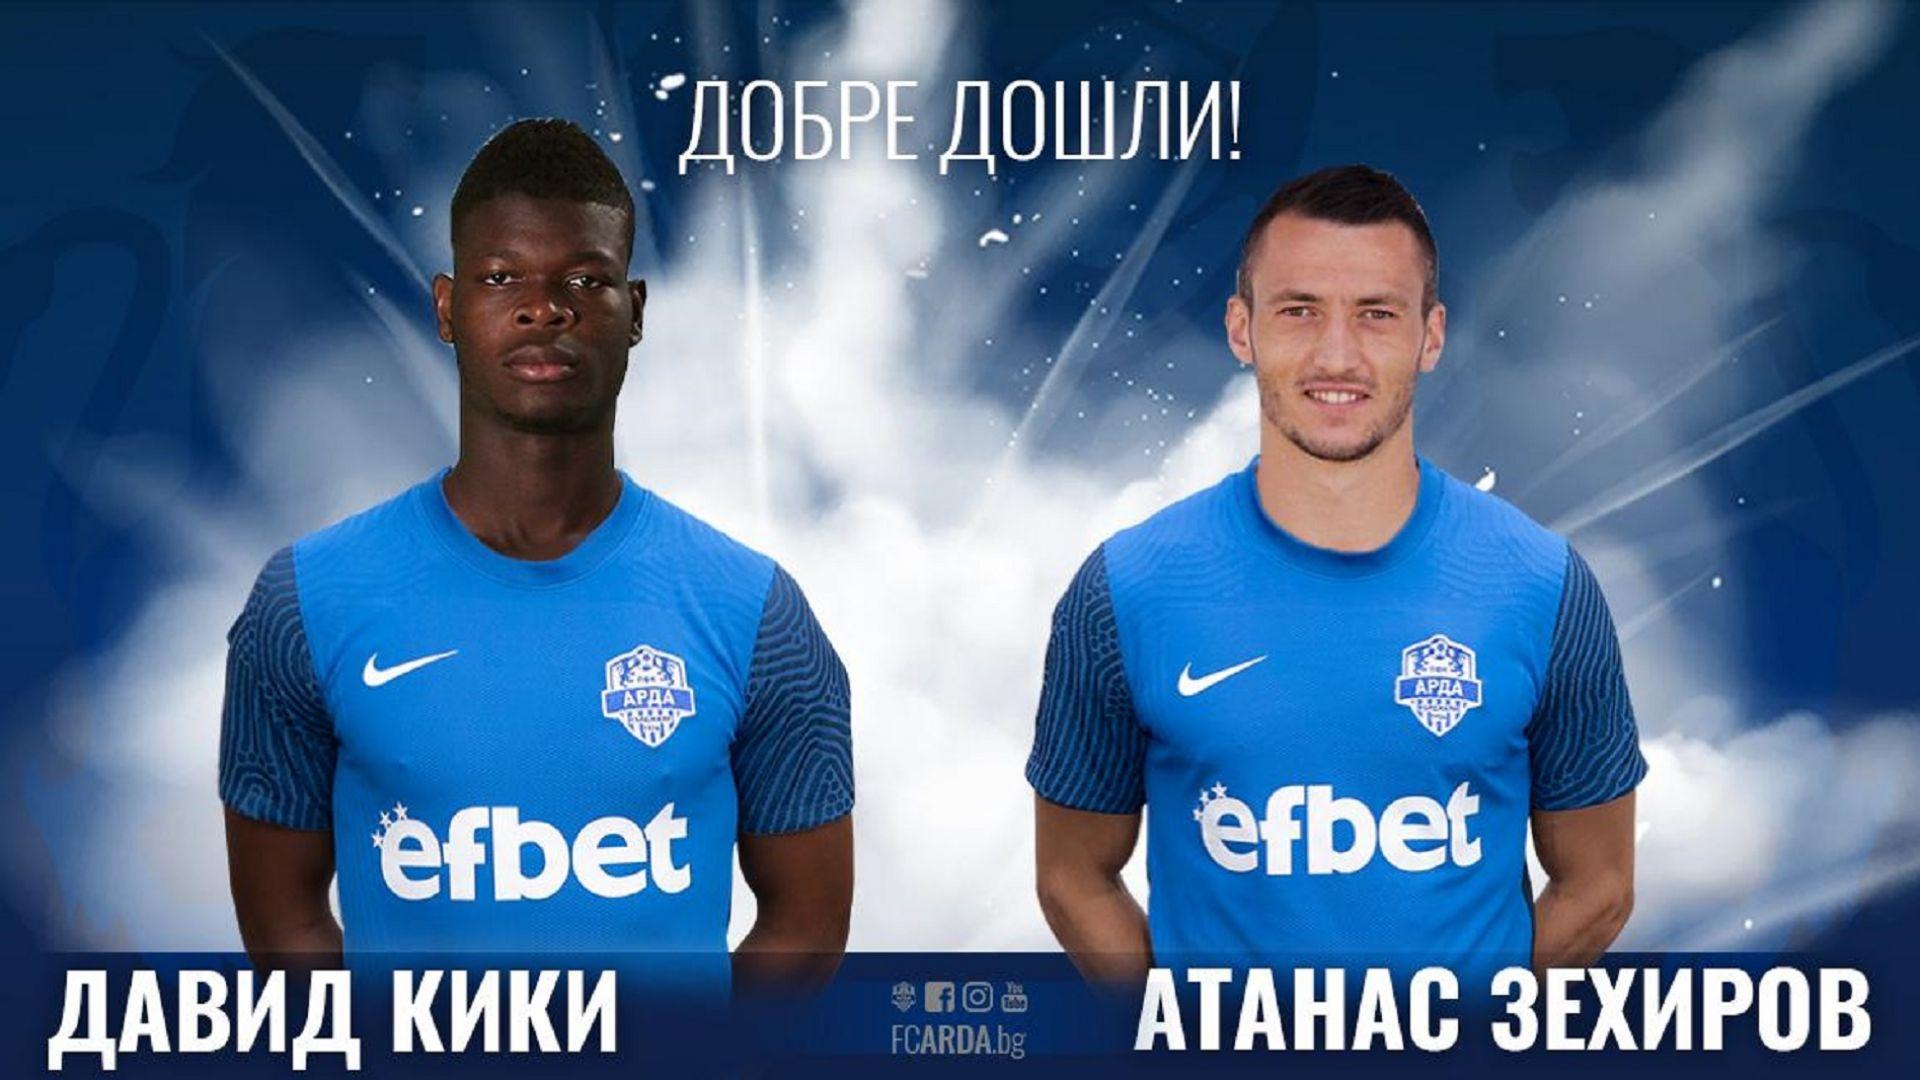 Арда обяви трансферите на двама играчи и един треньор